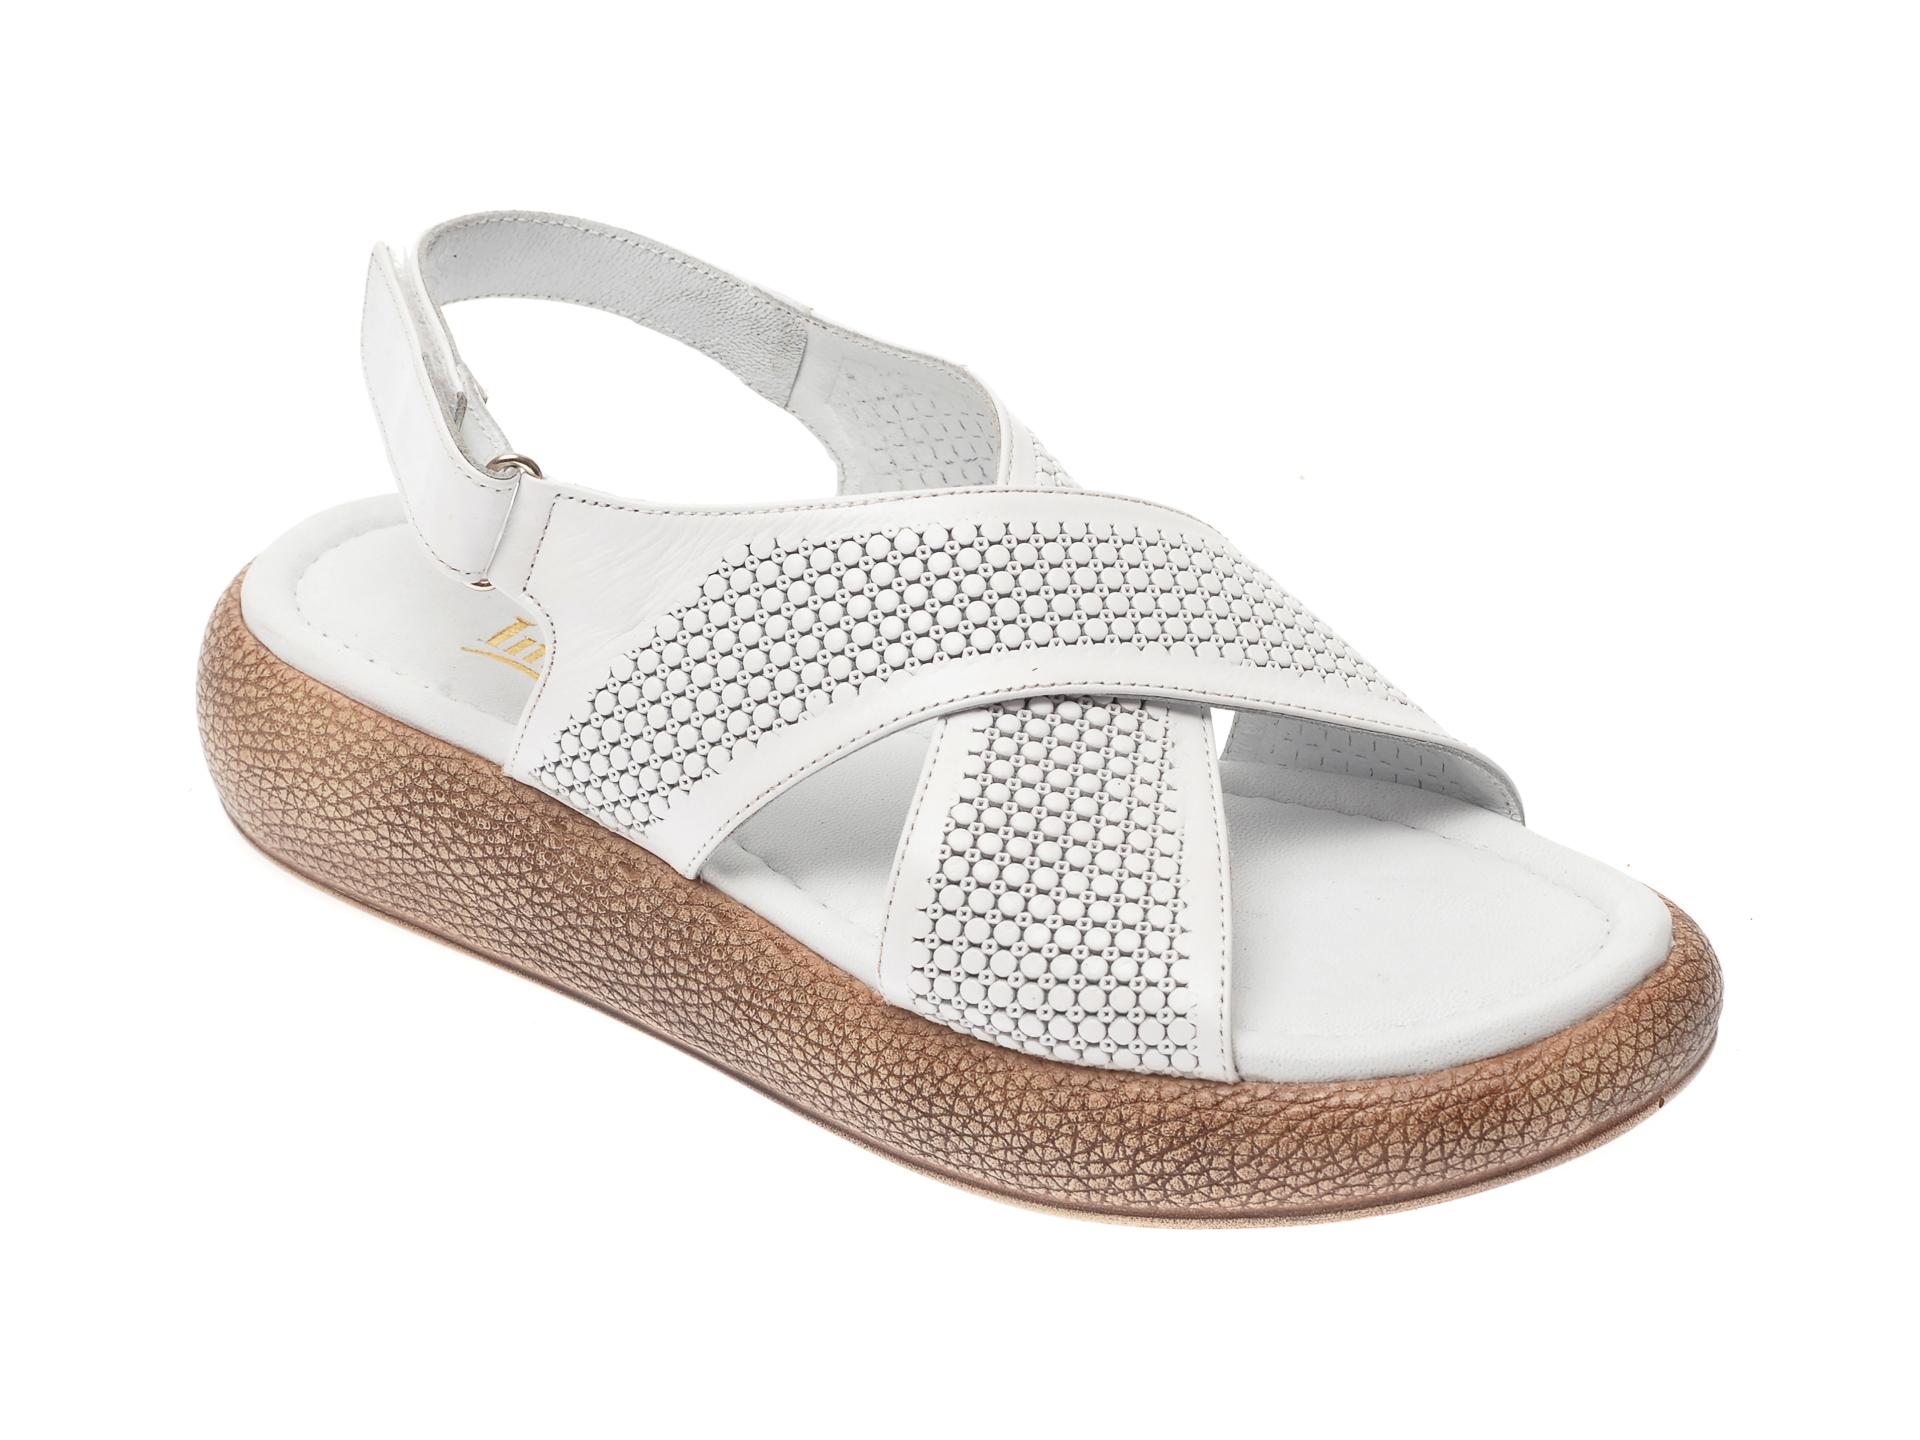 Sandale IMAGE albe, 6025, din piele naturala